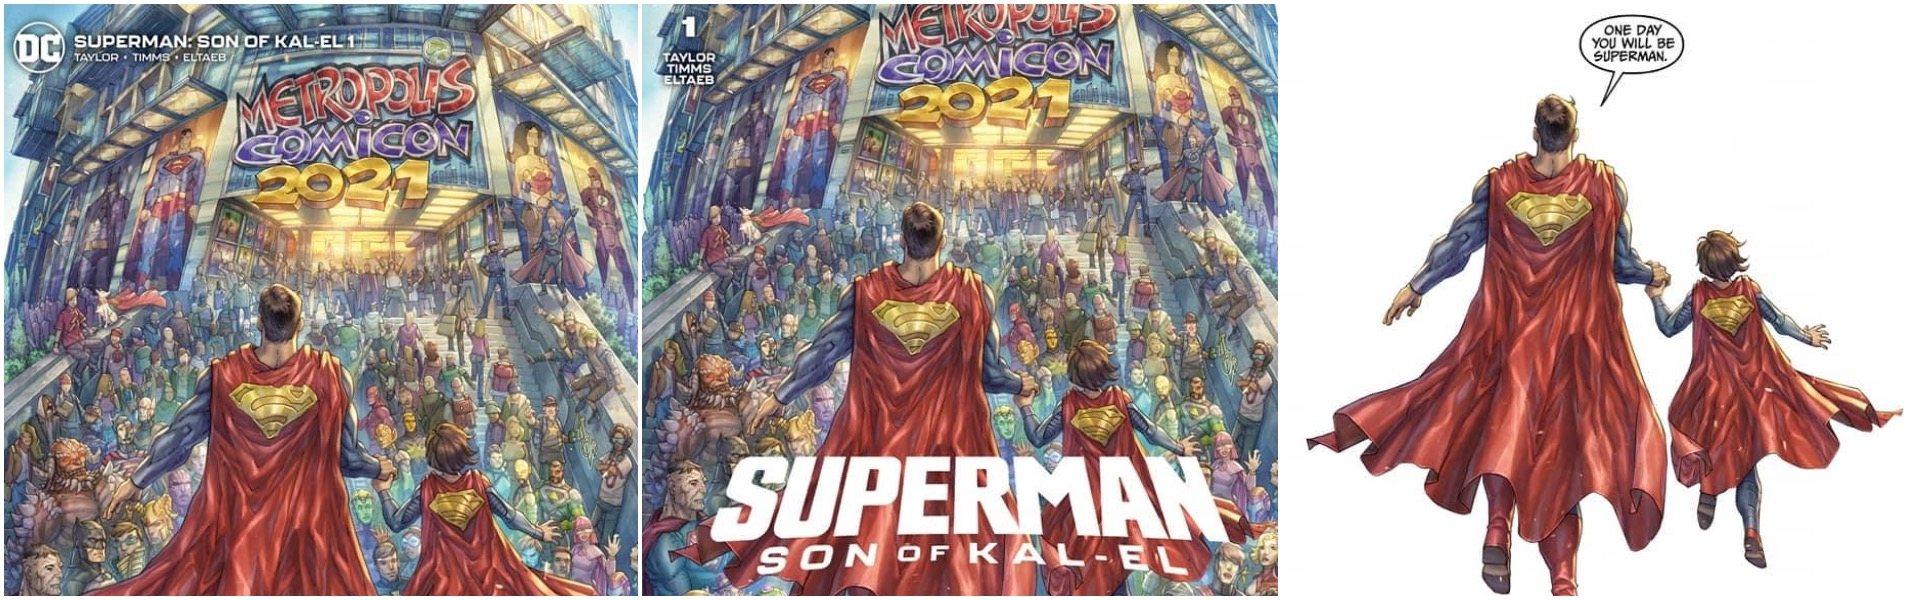 Superman Son of Kal-El #1 Alan Quah Variants